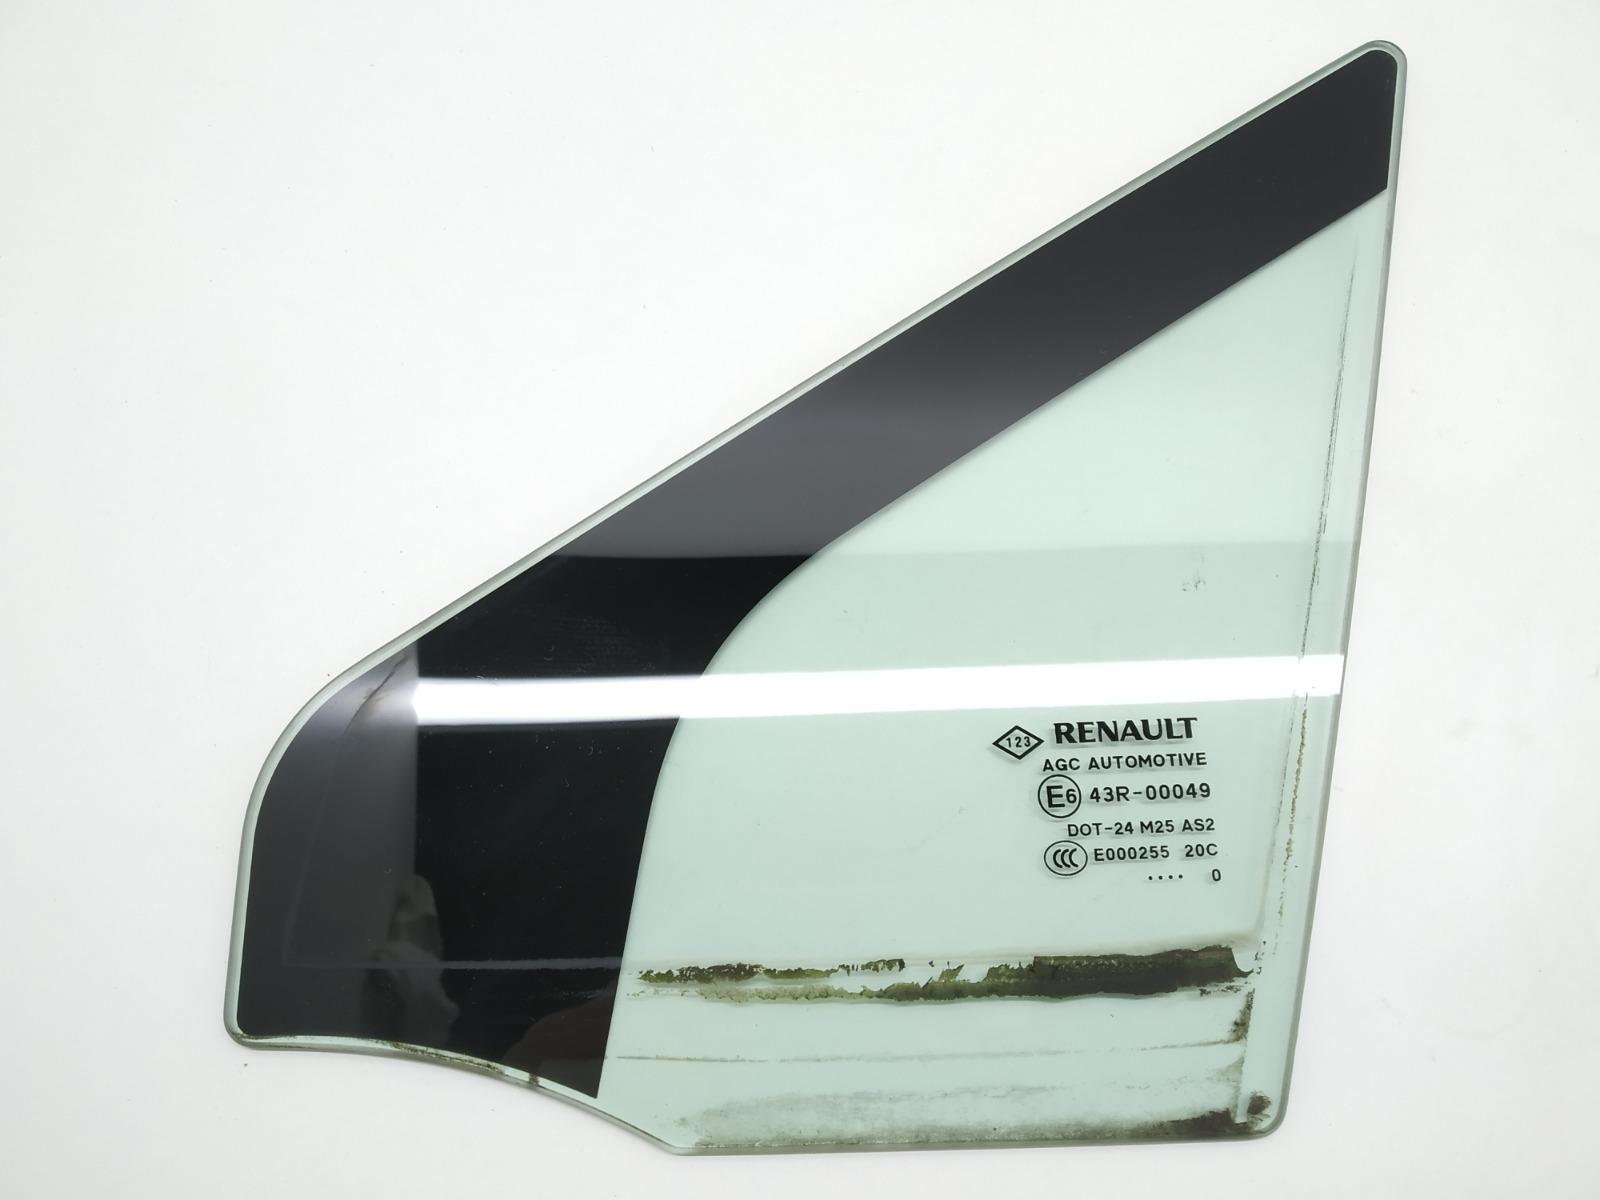 Форточка передняя левая Renault Grand Scenic 1.5 DCI 2010 (б/у)